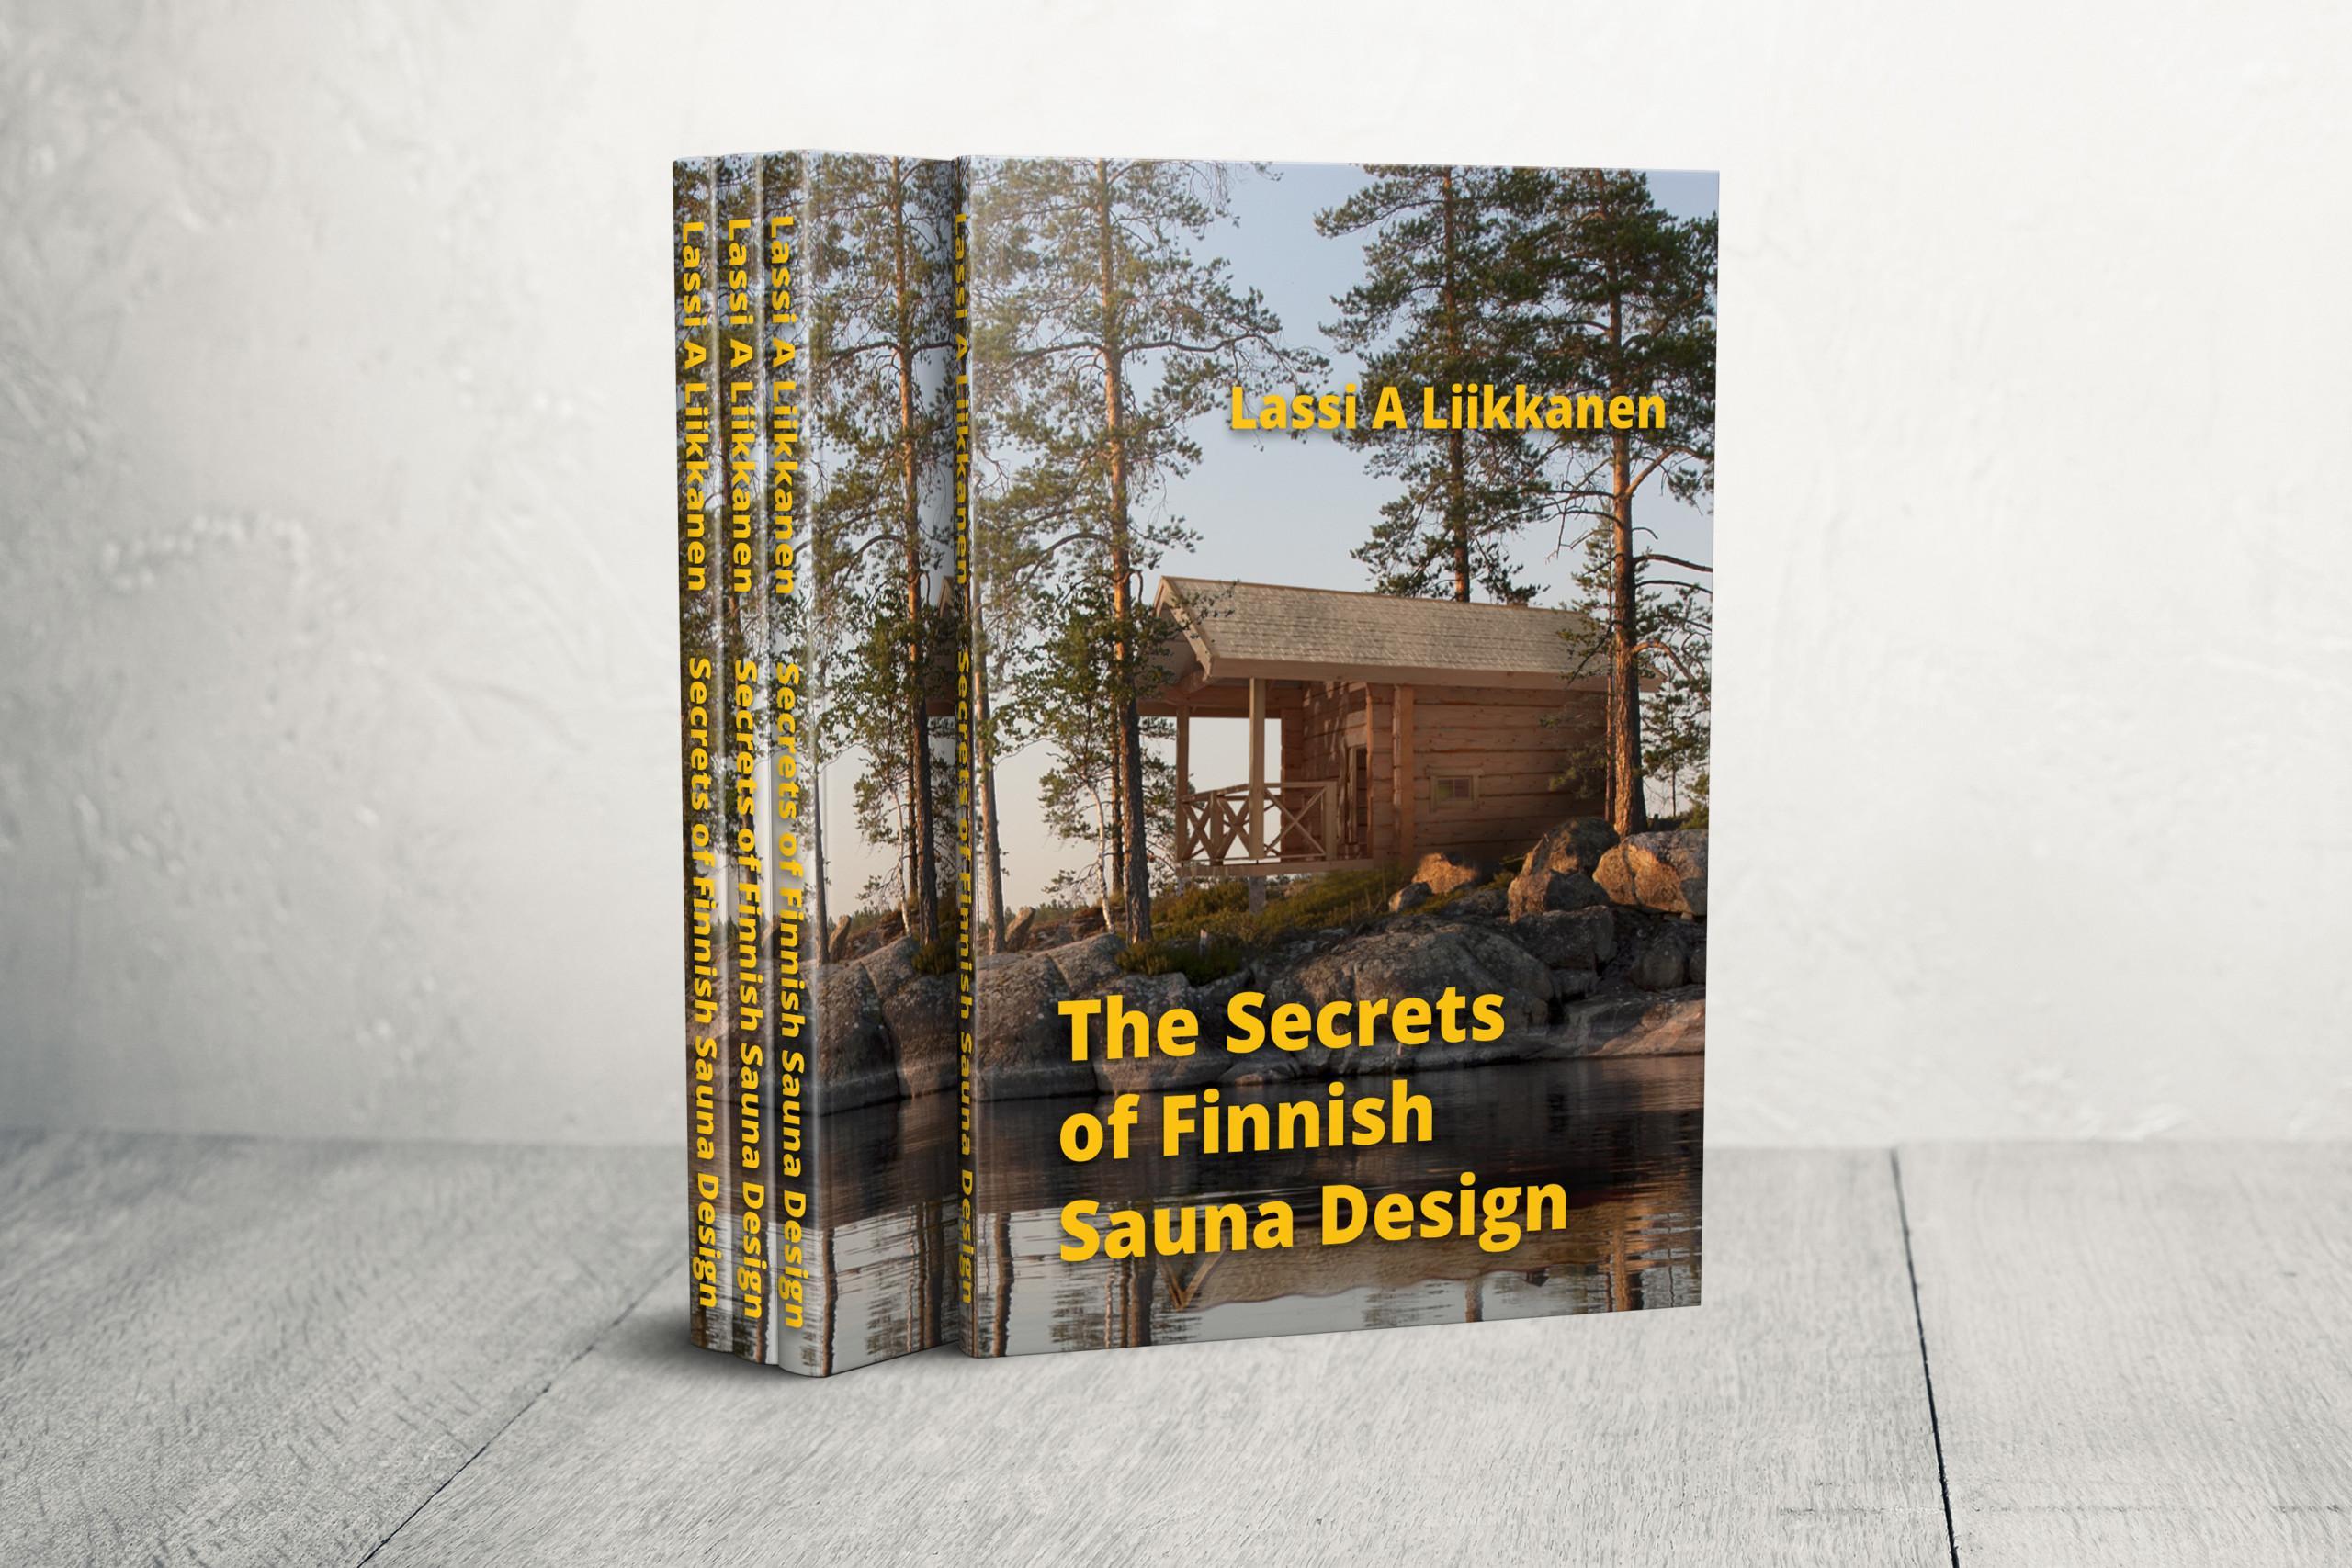 The Secret of Finnish Sauna Design